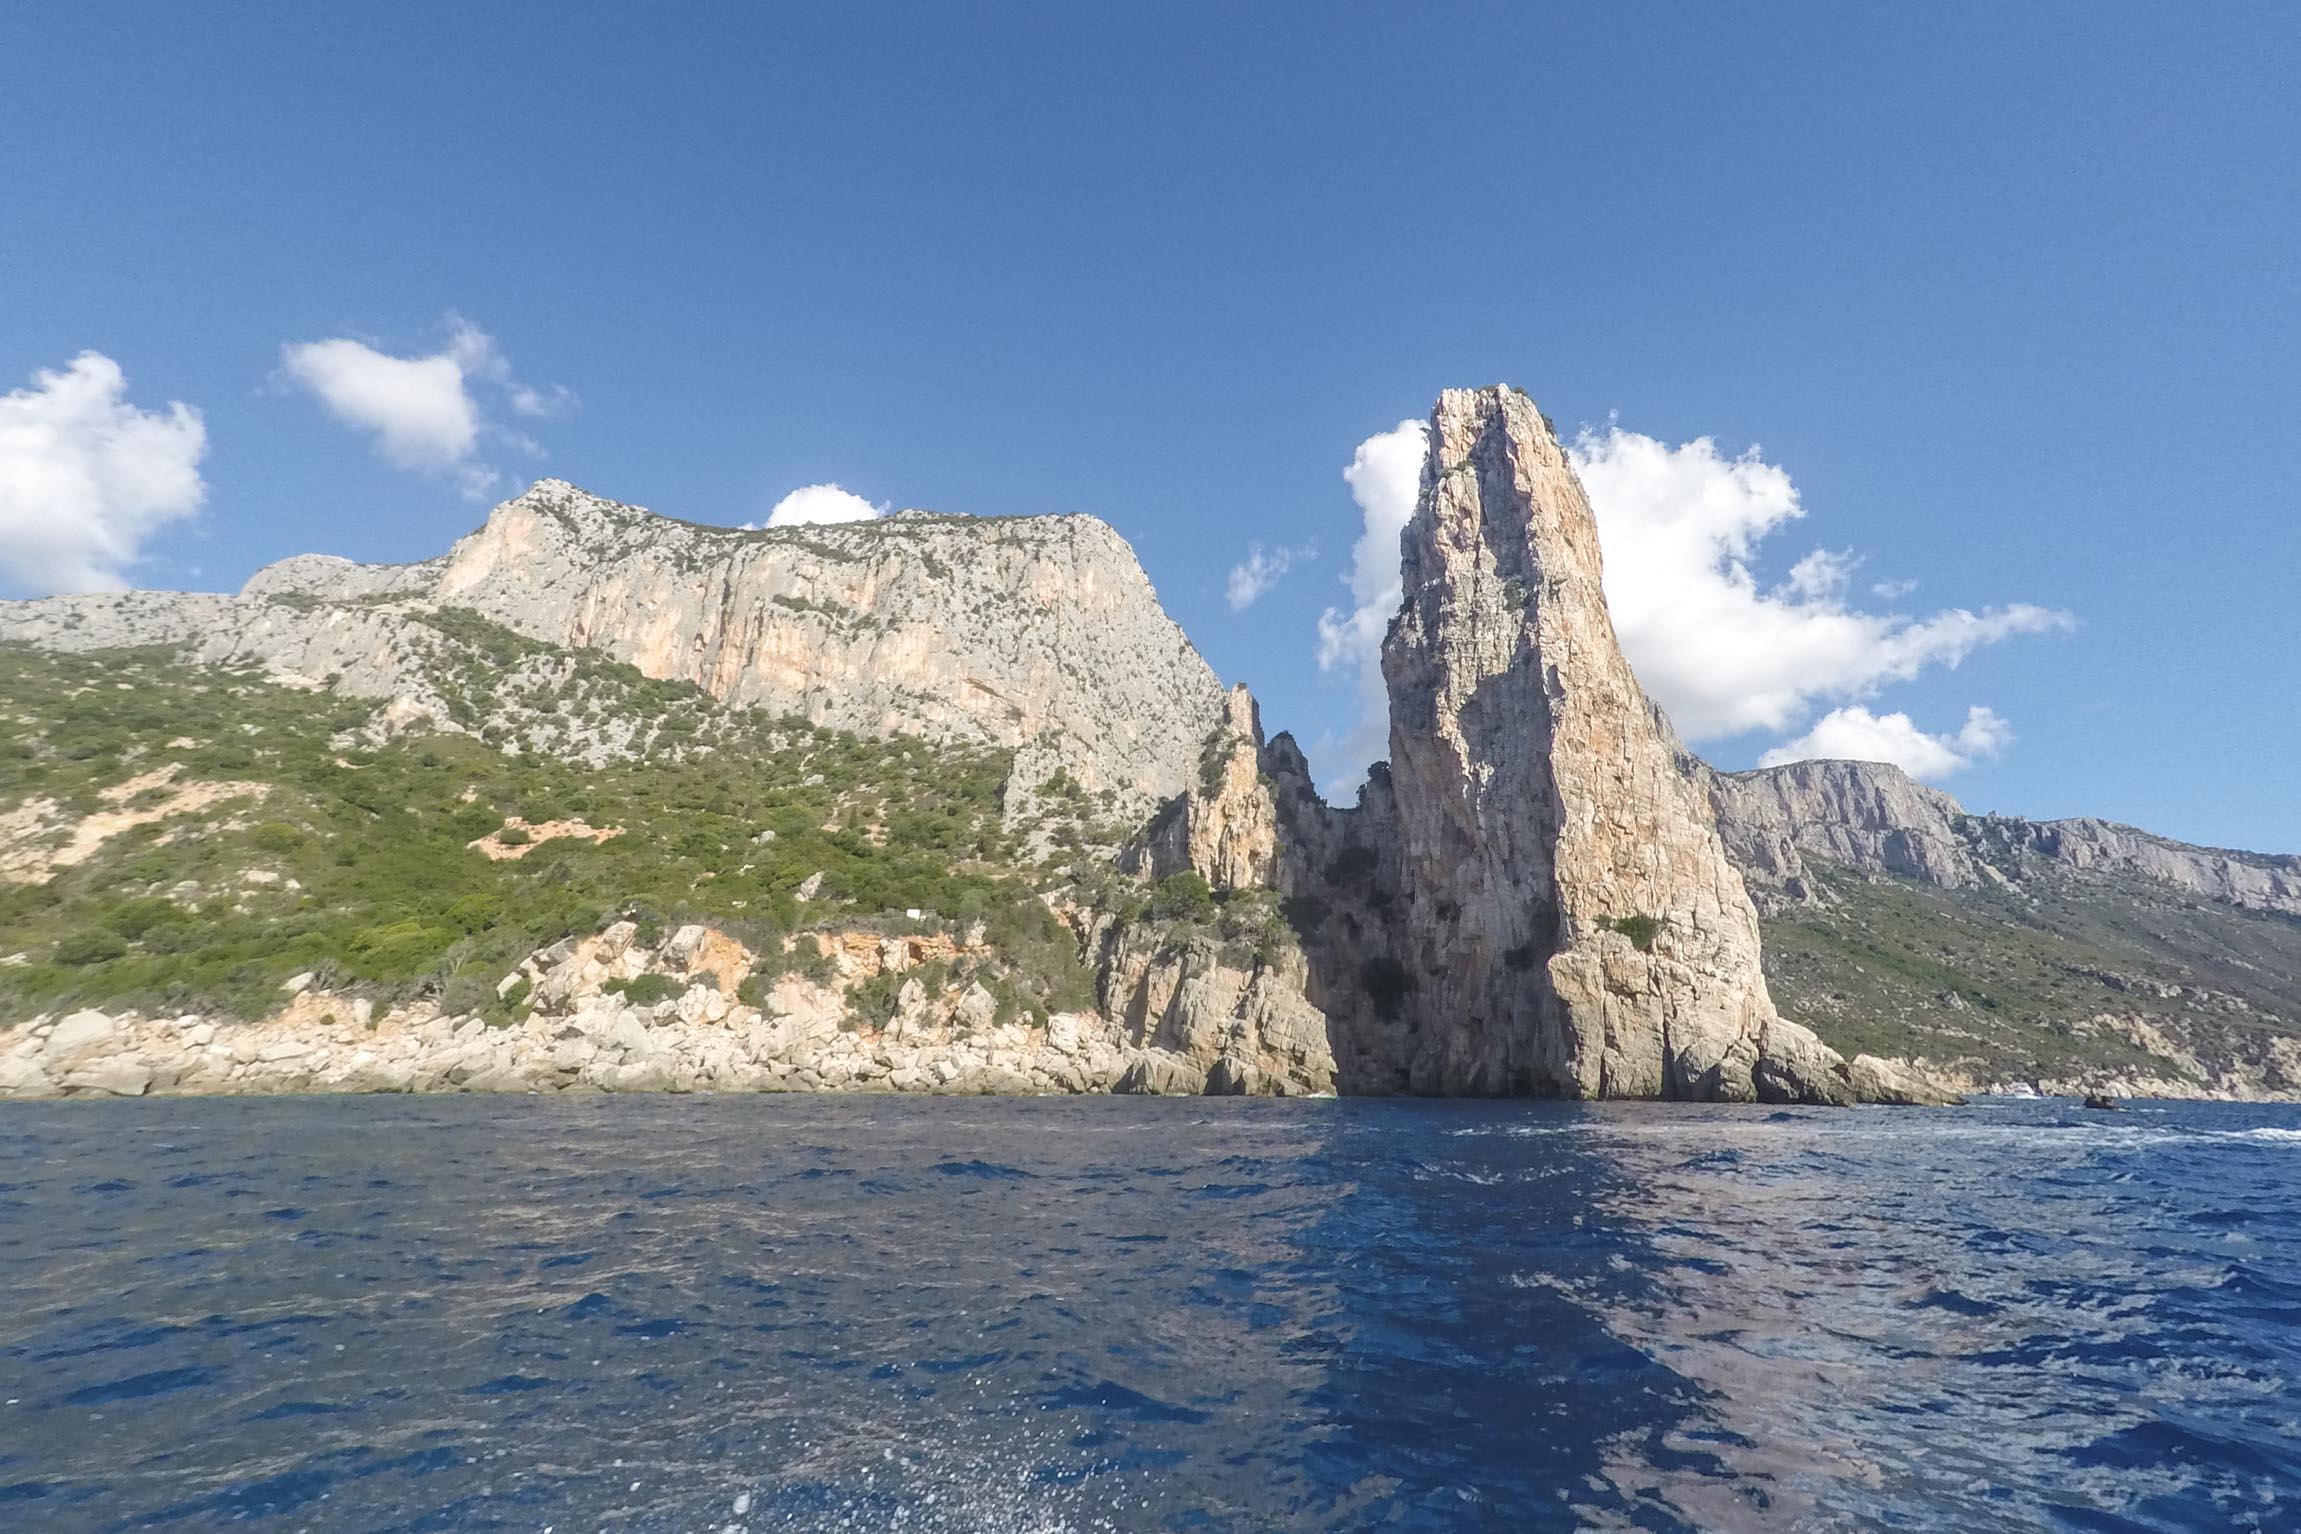 Bari Sardo in 2 giorni: Pedra Longa nei pressi di Santa Maria Navarrese